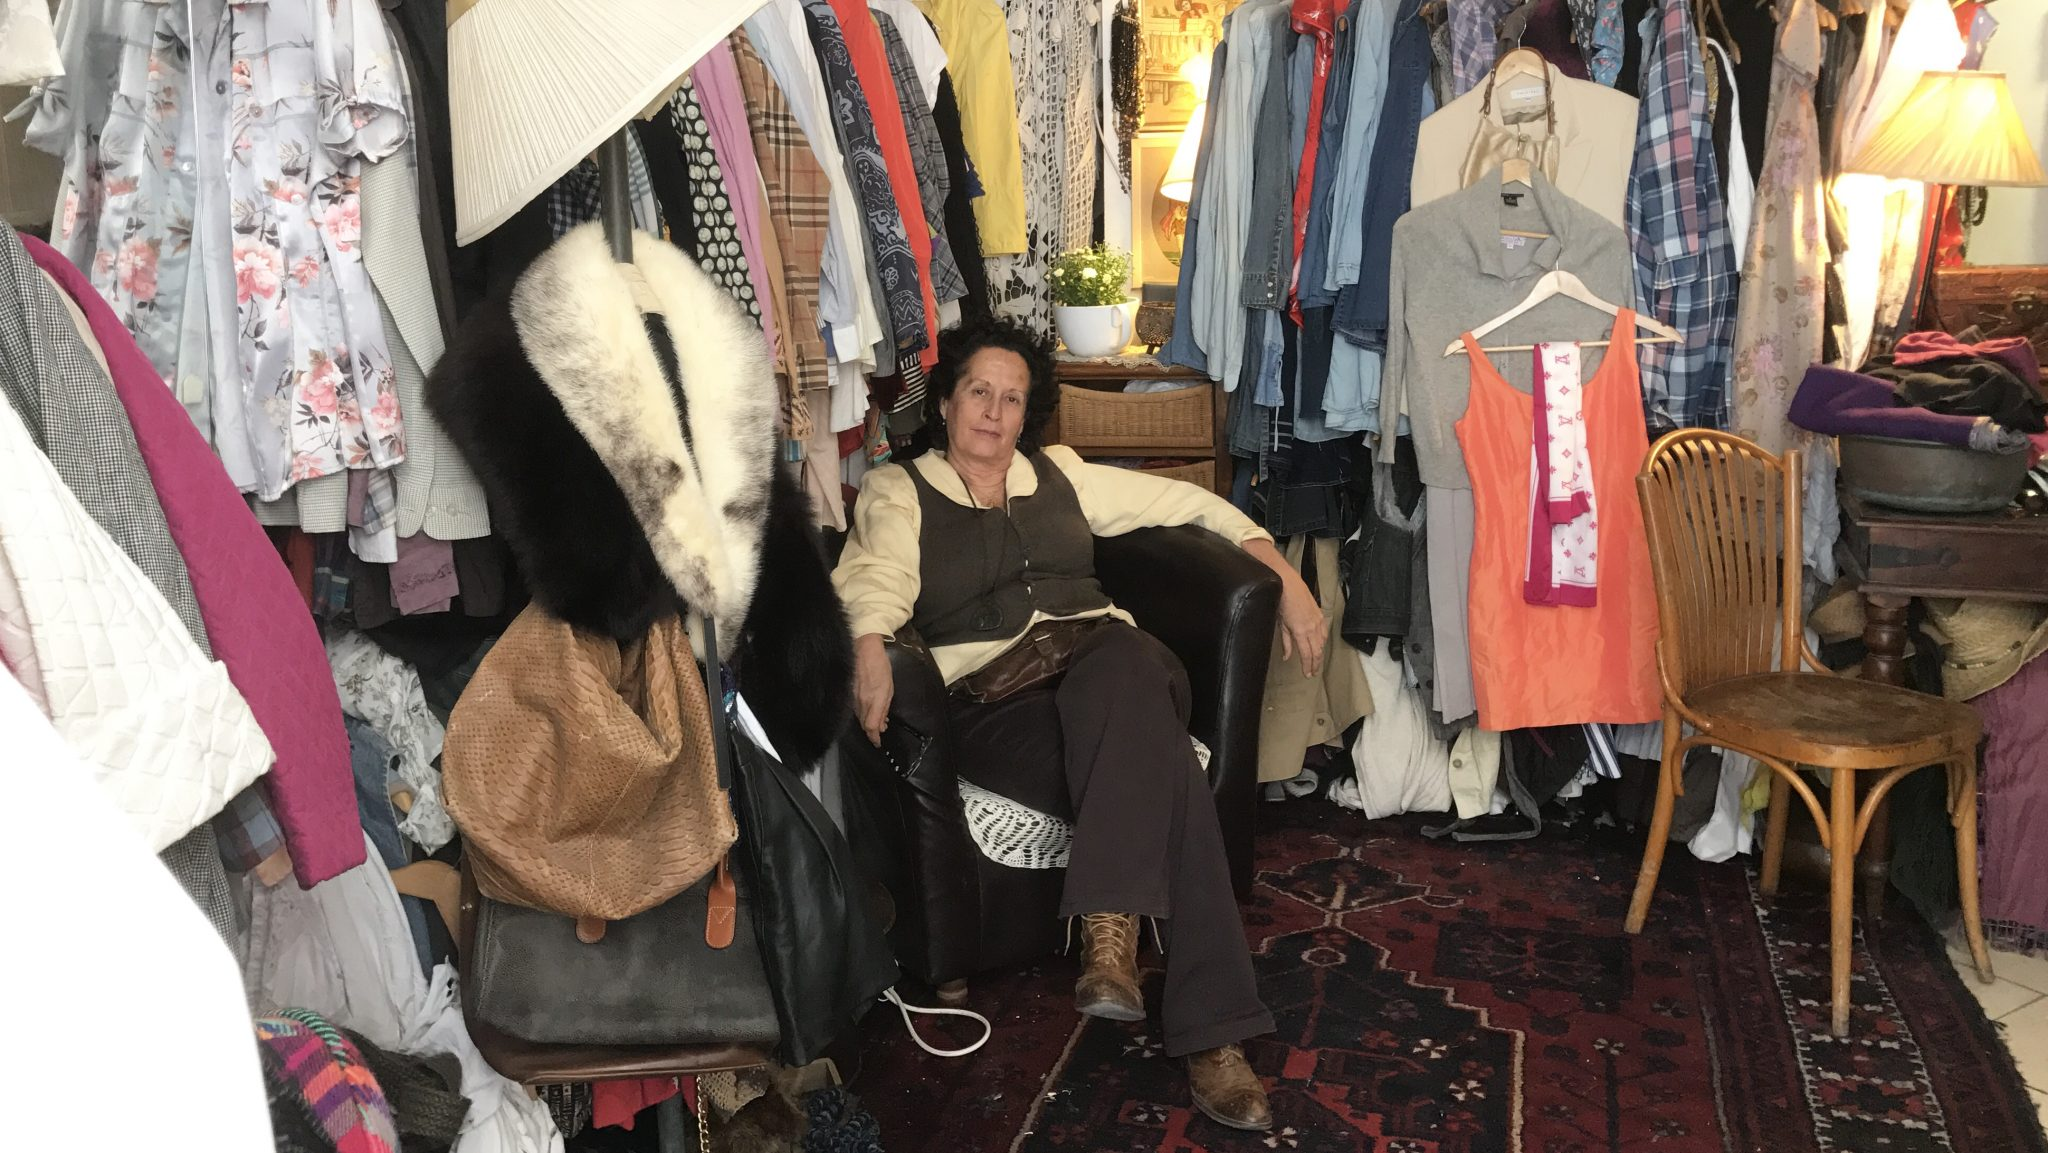 Vintage clothing shops mushroom in Tel Aviv | ISRAEL21c